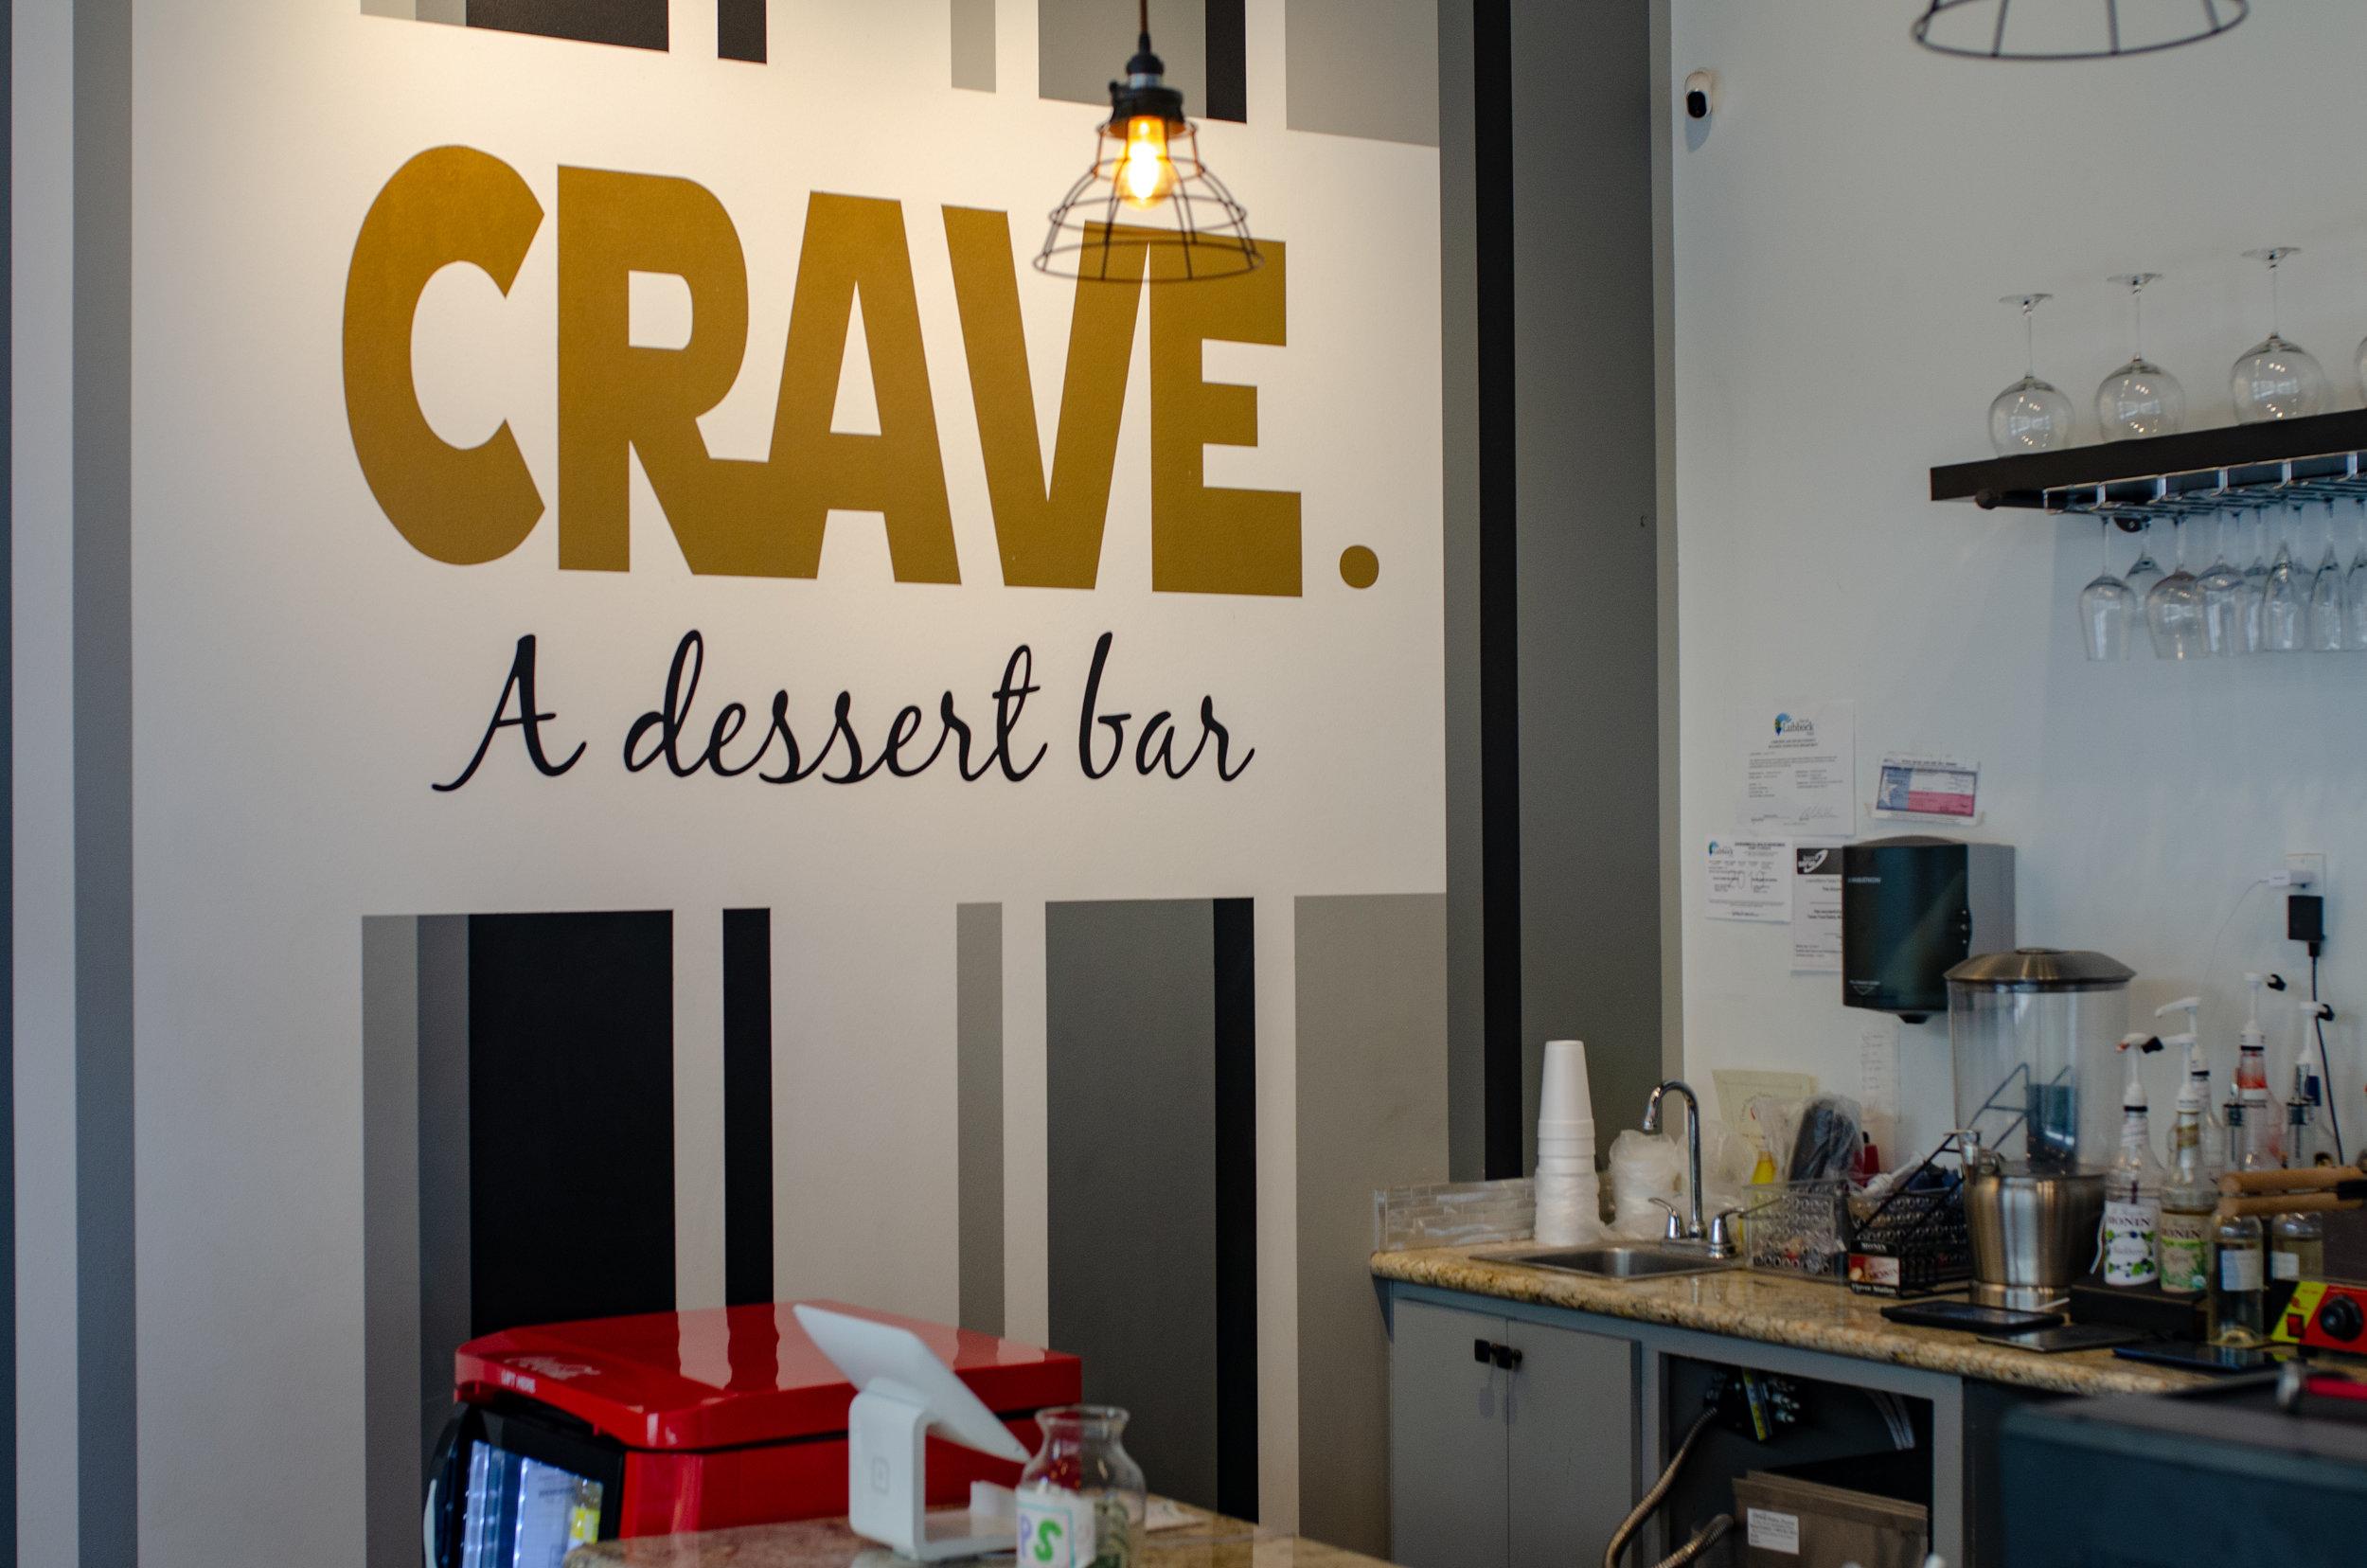 Crave.jpg